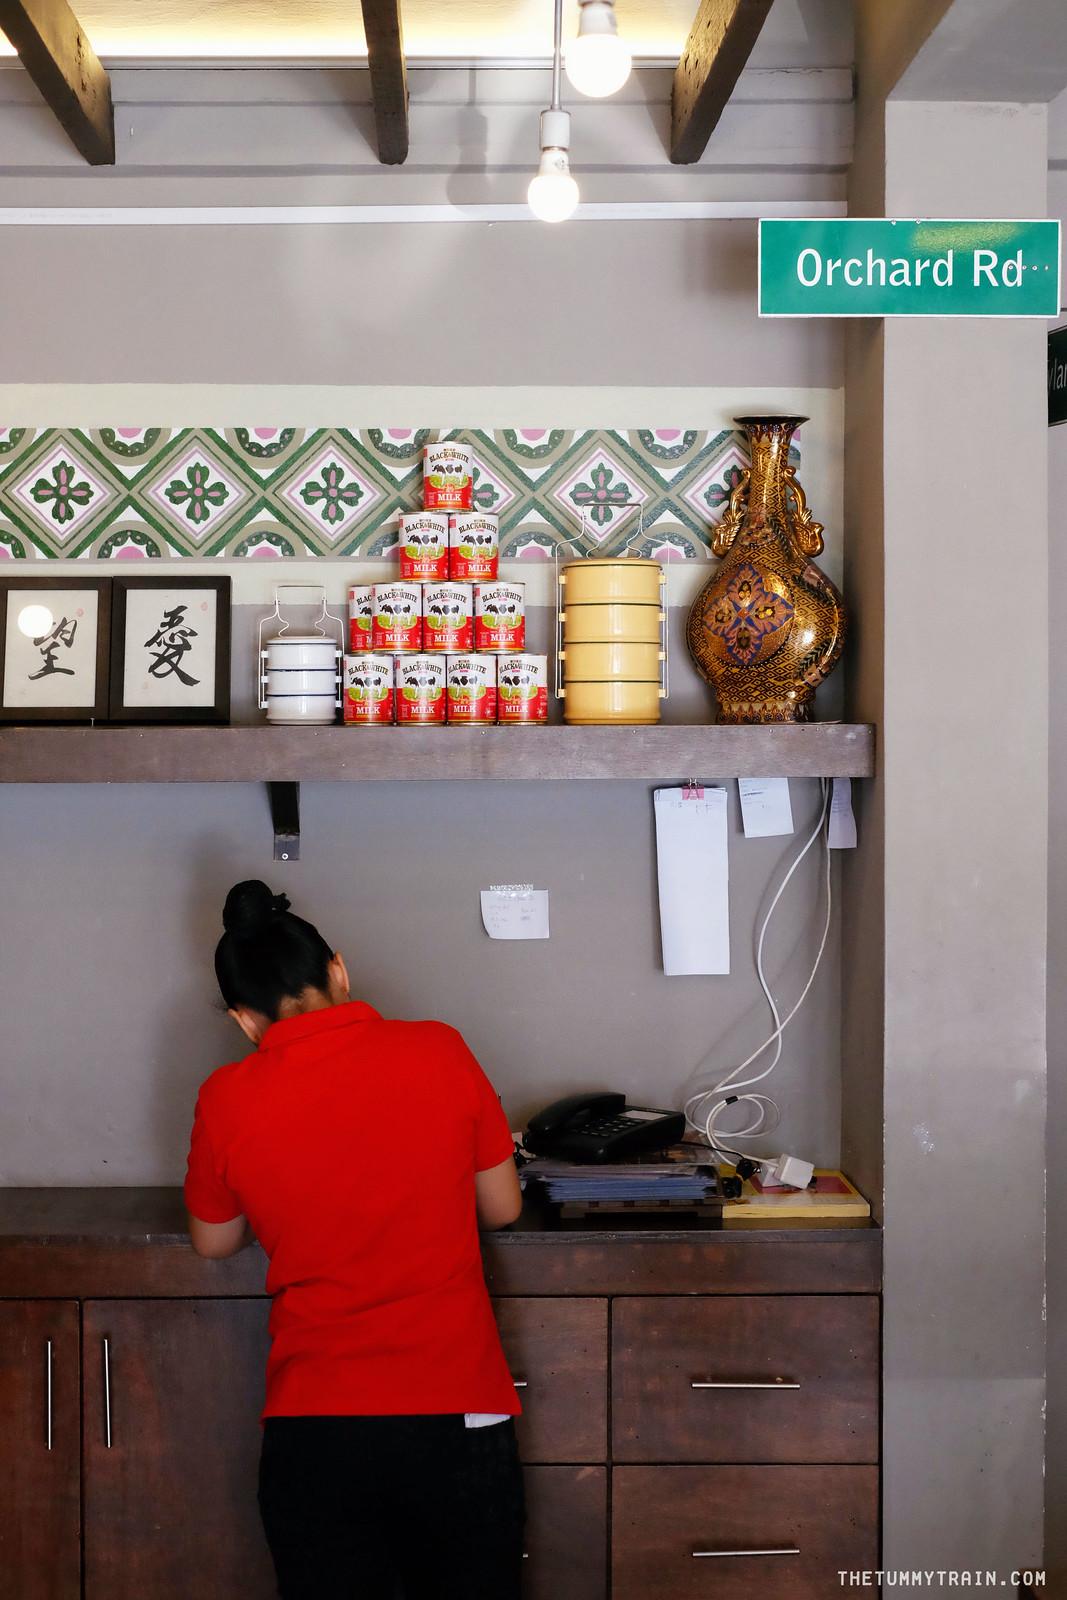 33919816760 c8f884c240 h - A full serving of Singaporean fare at Shiok Shiok QC